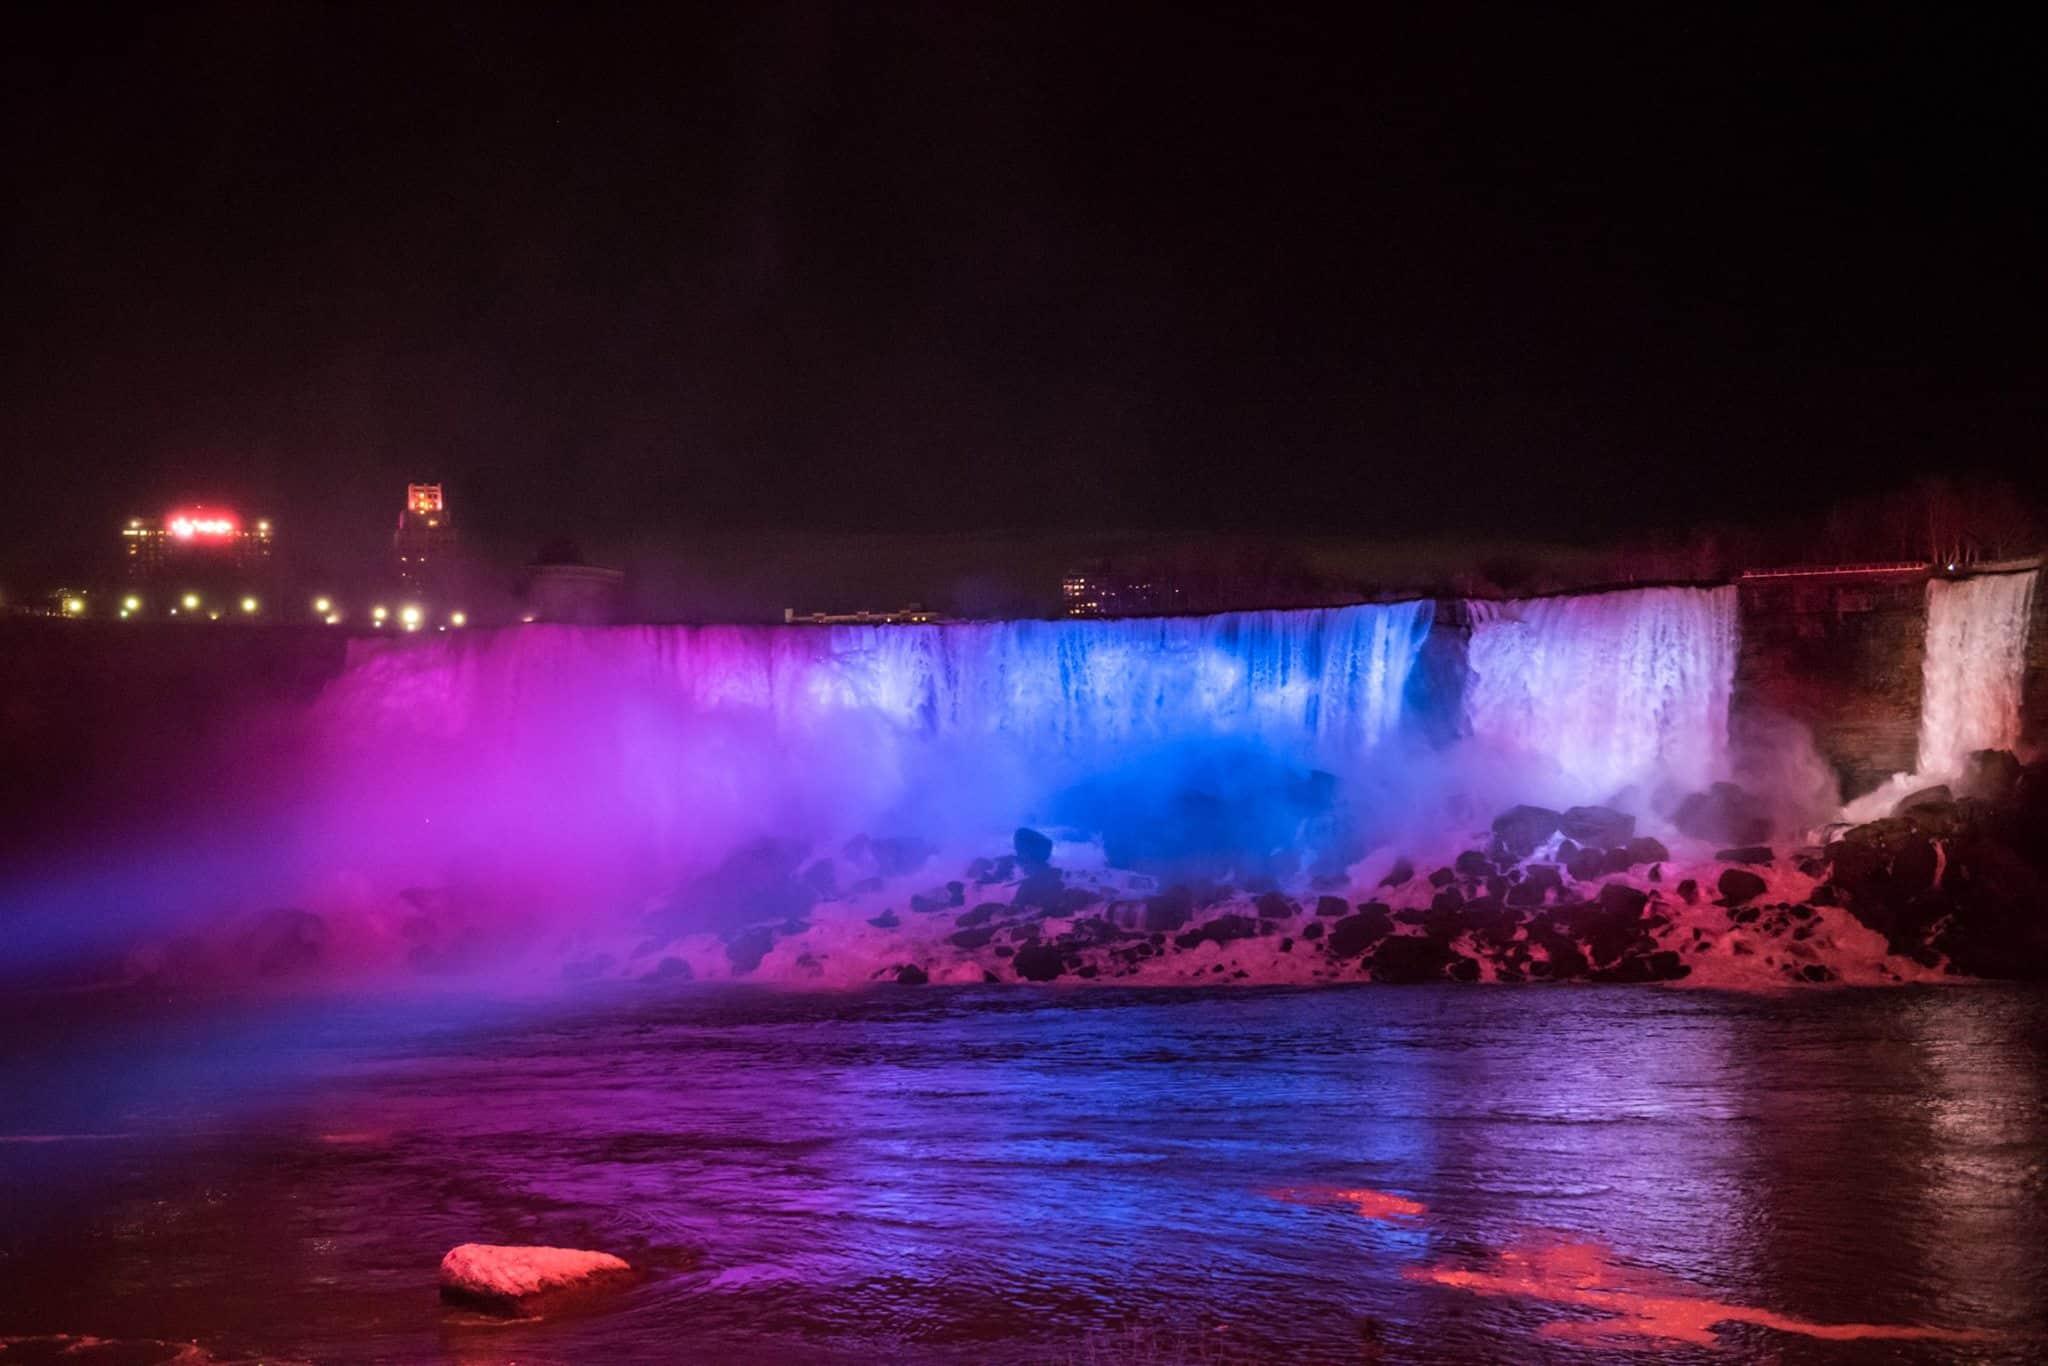 Niagara Falls Shines In New Light